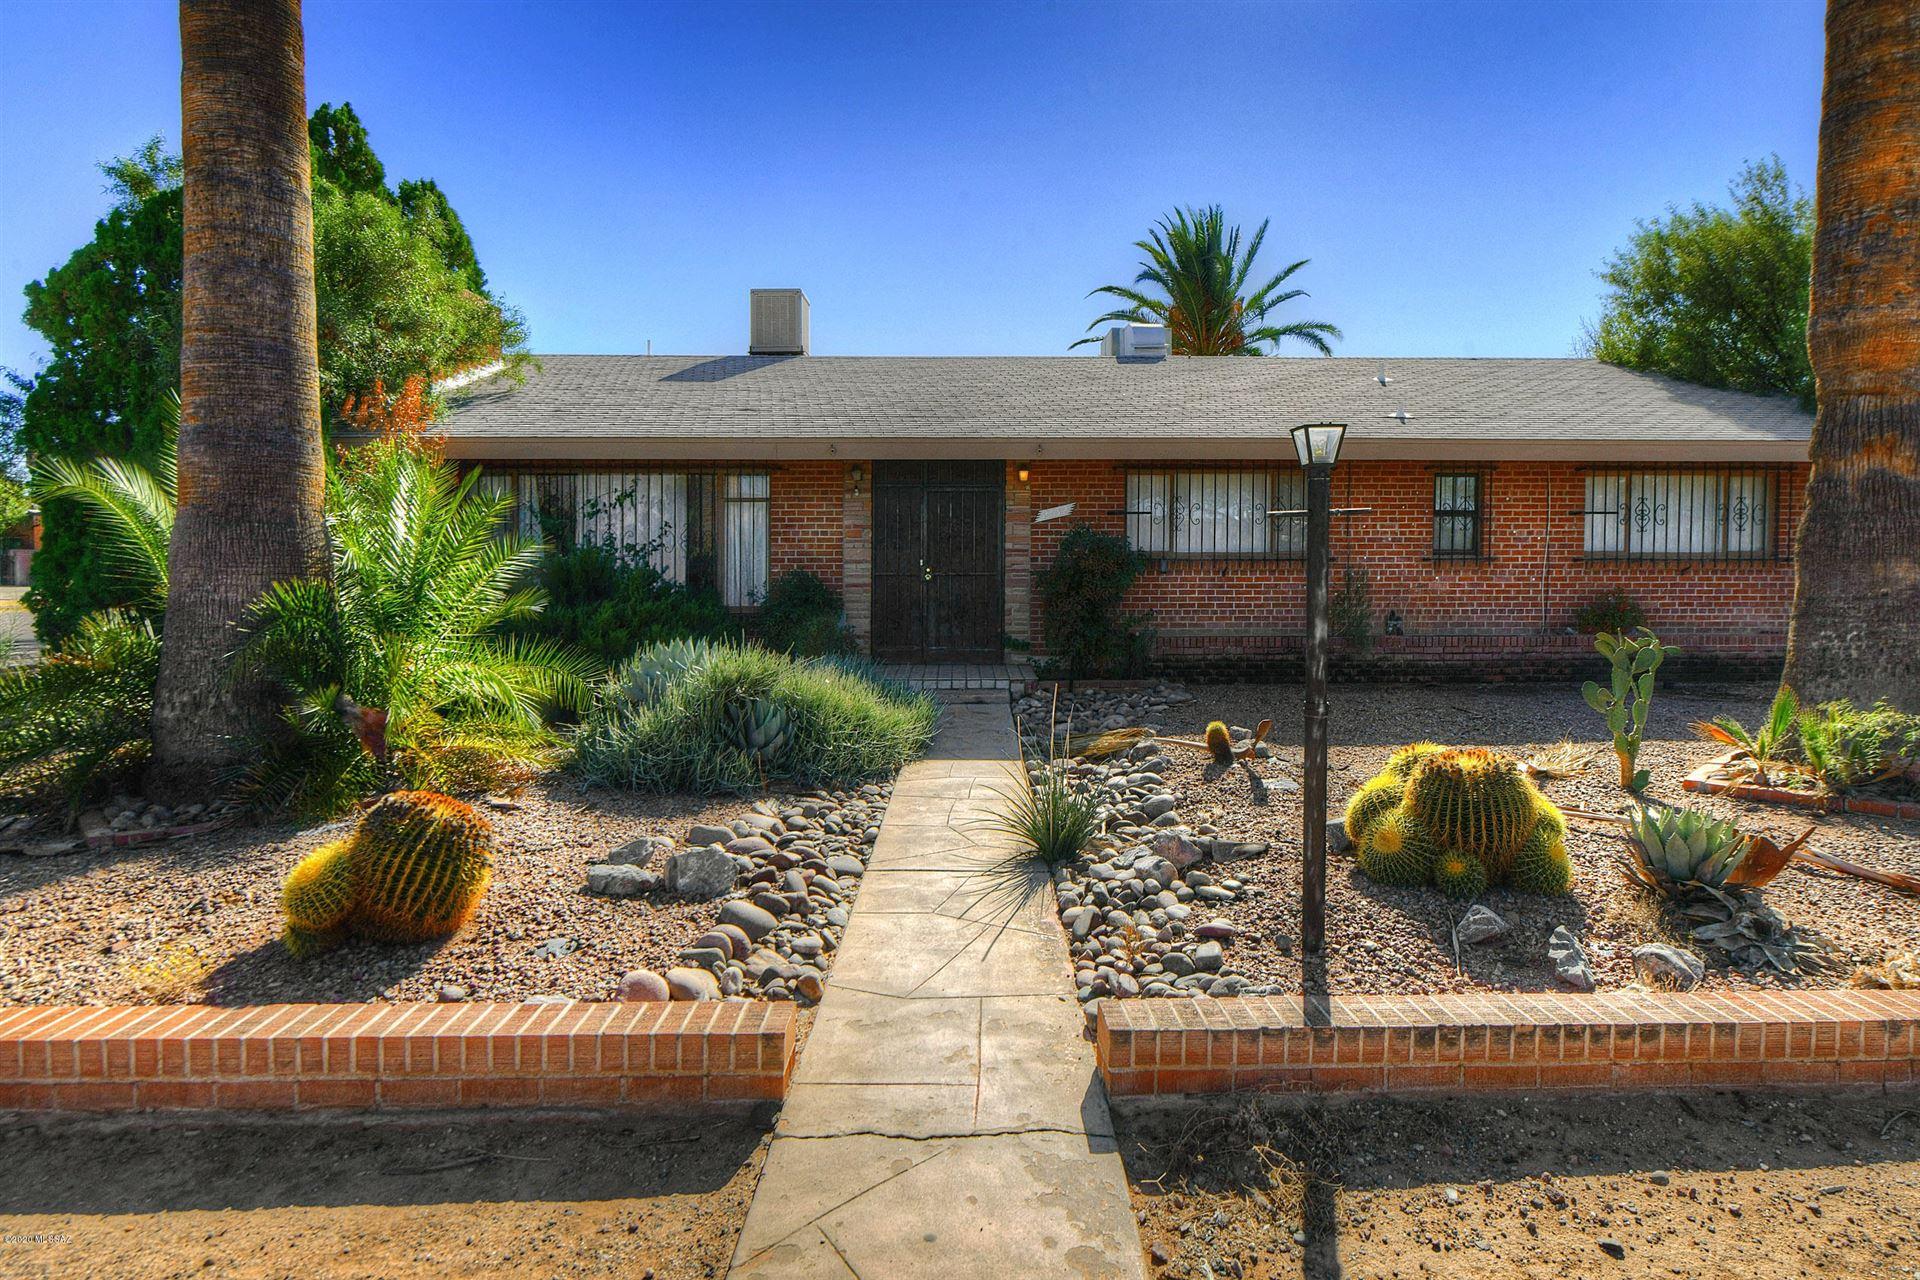 2132 E Blacklidge Drive, Tucson, AZ 85719 - MLS#: 22030349